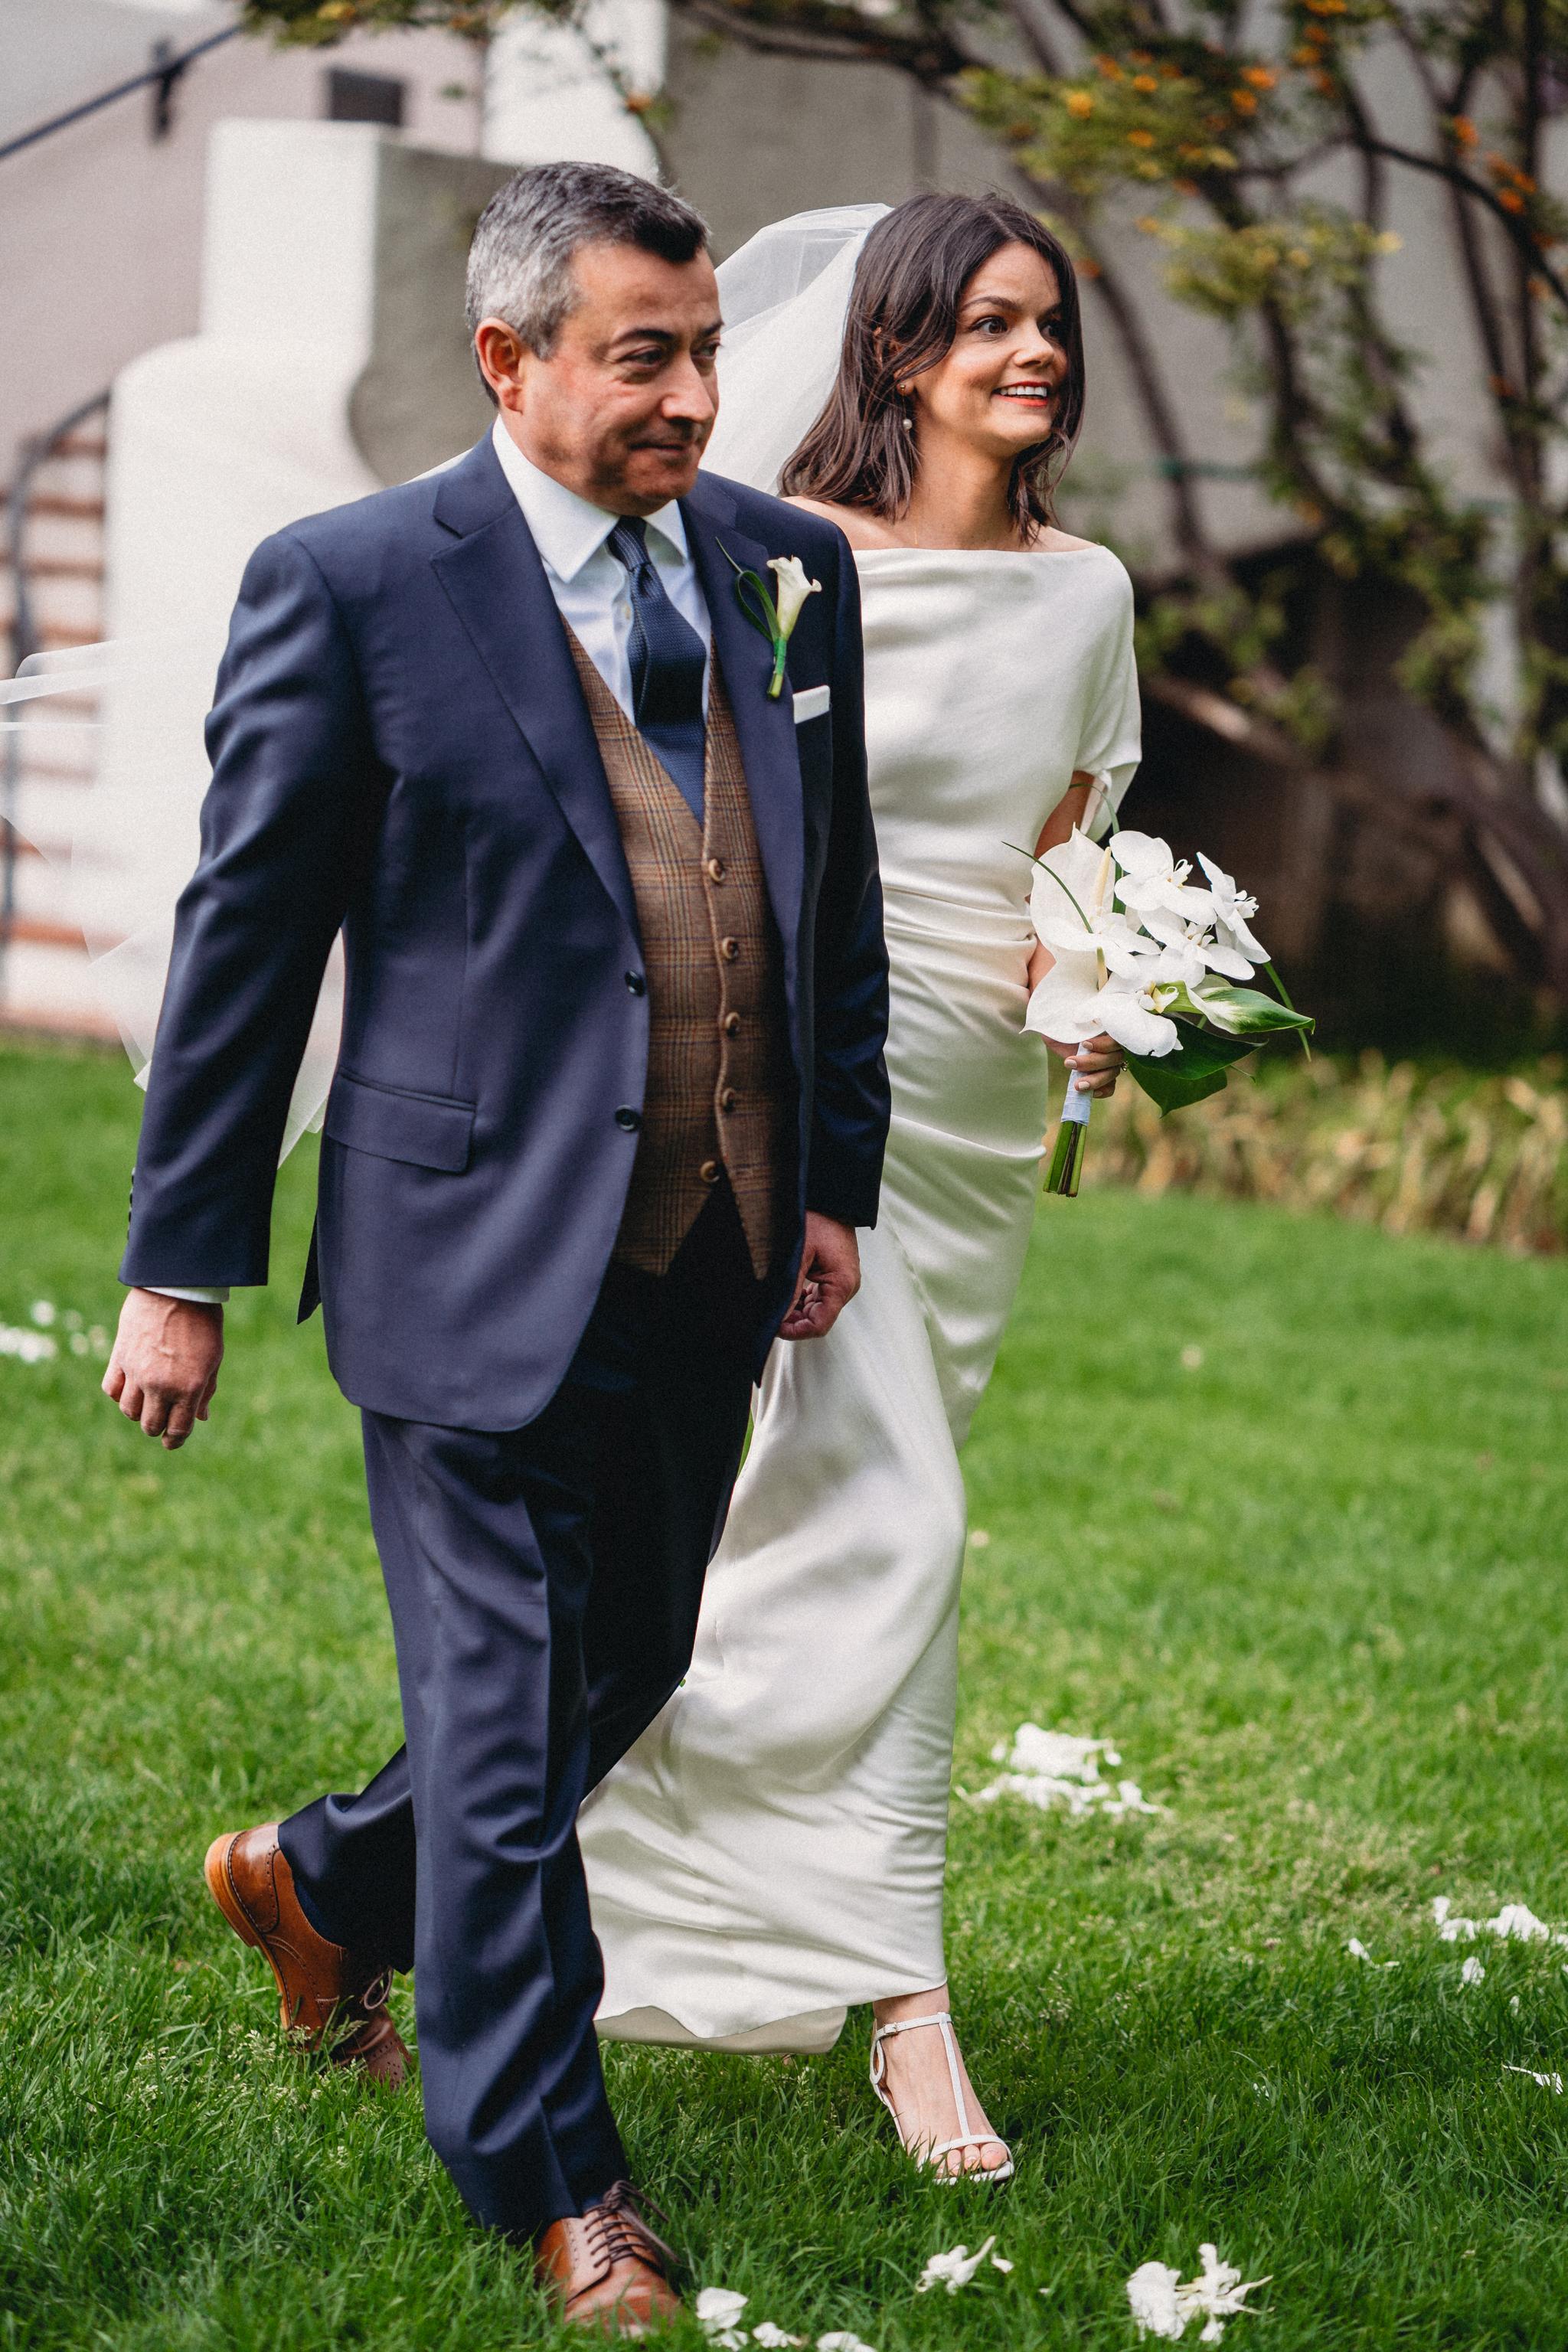 wedding-photography-santa-barbara-courthouse-rebeccaylasotras-41.jpg